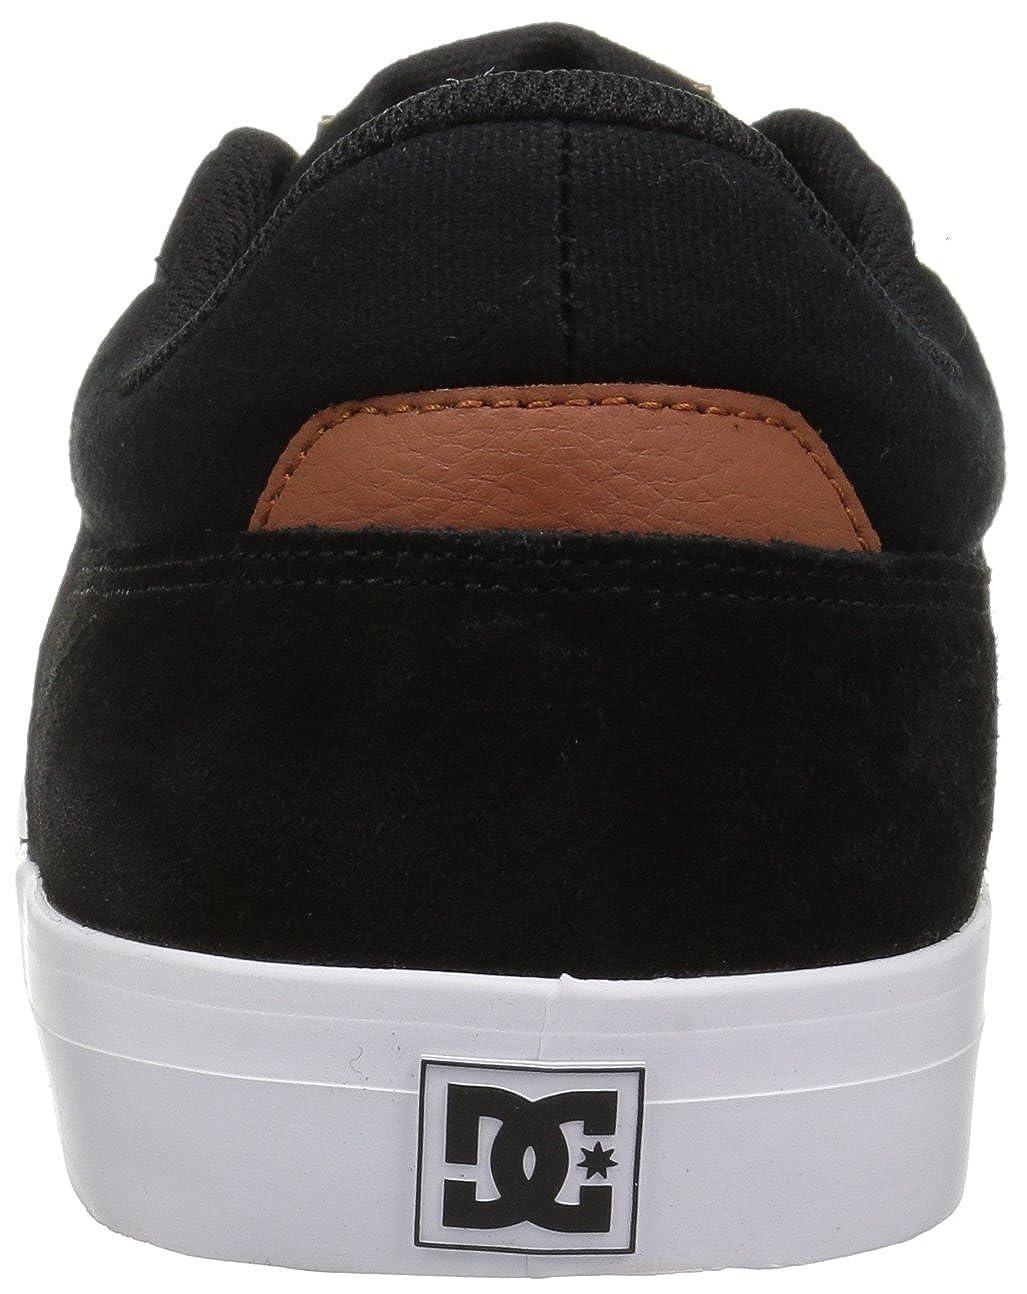 DC schuhe Wes Kremer - Schuhe für Männer ADYS300315 B01LYF68CX B01LYF68CX B01LYF68CX  927c41